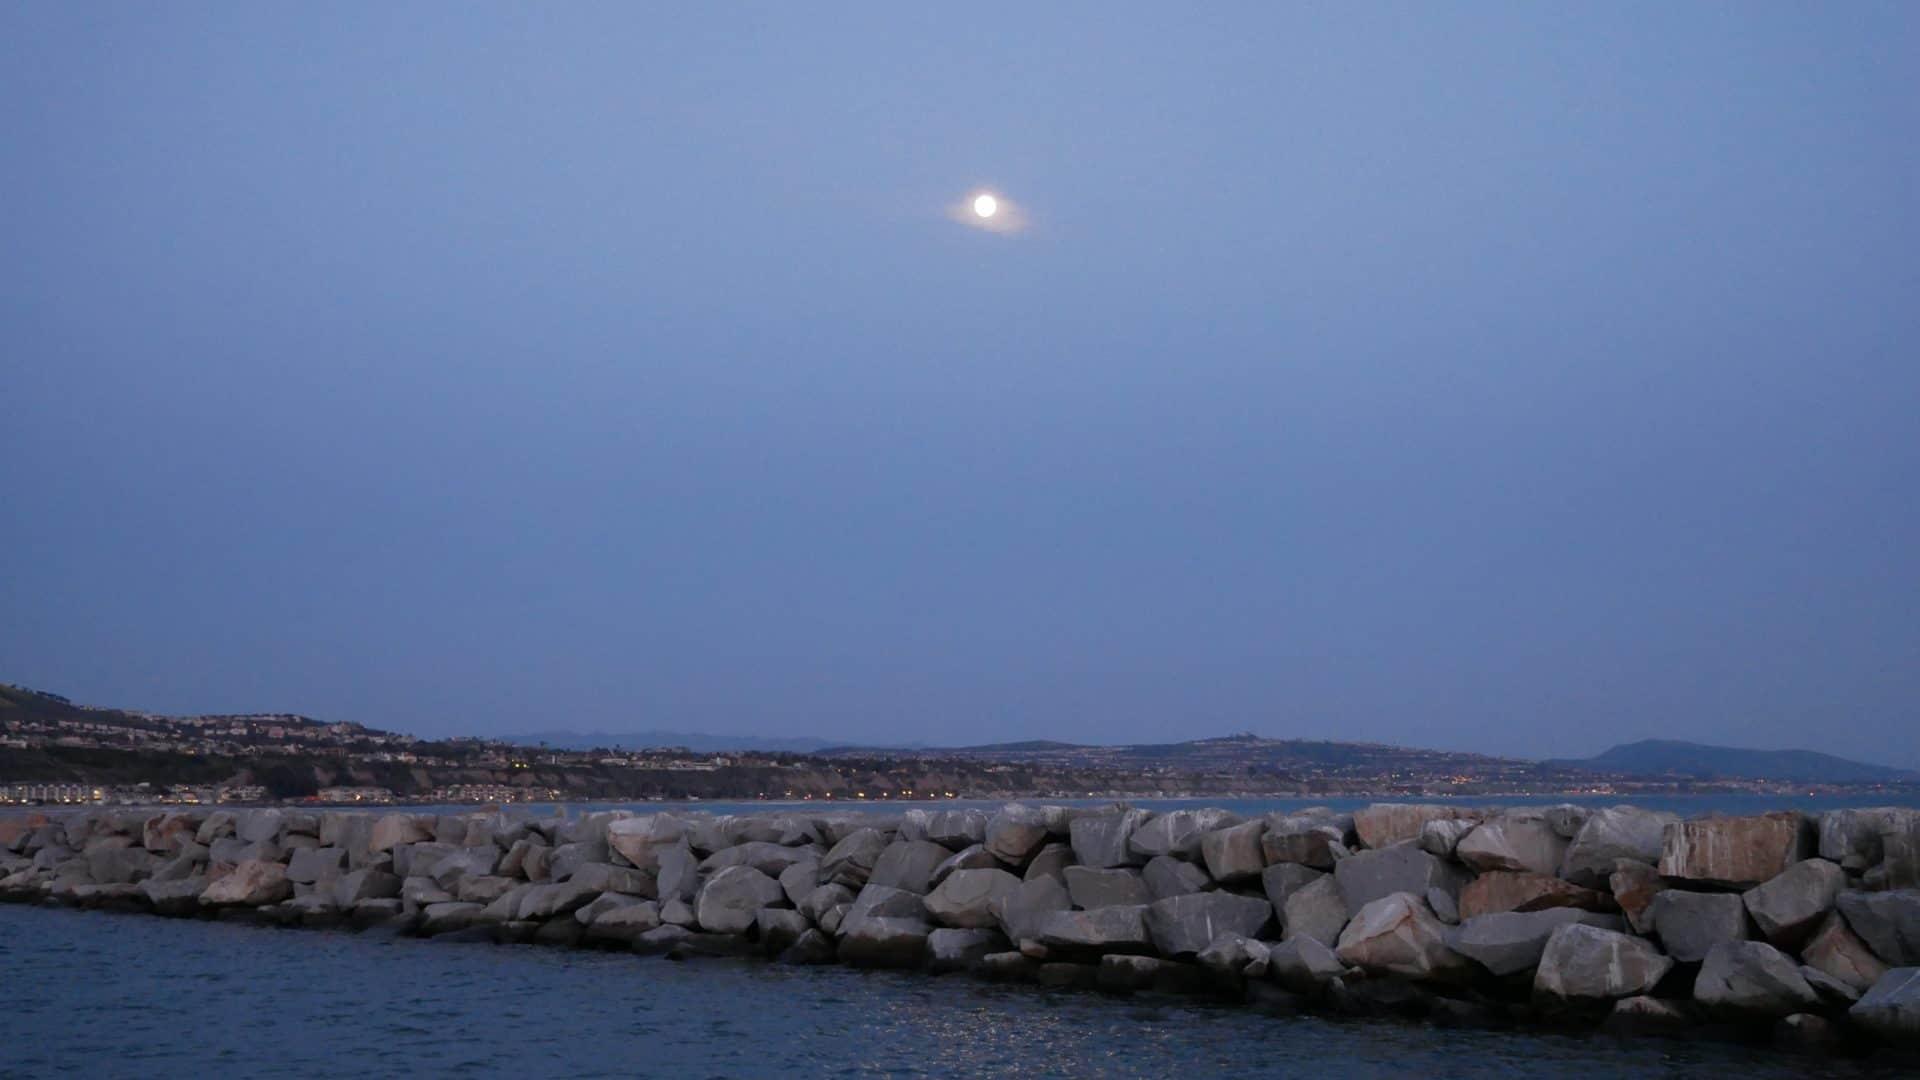 Breakwater with moon at Dana Point, California